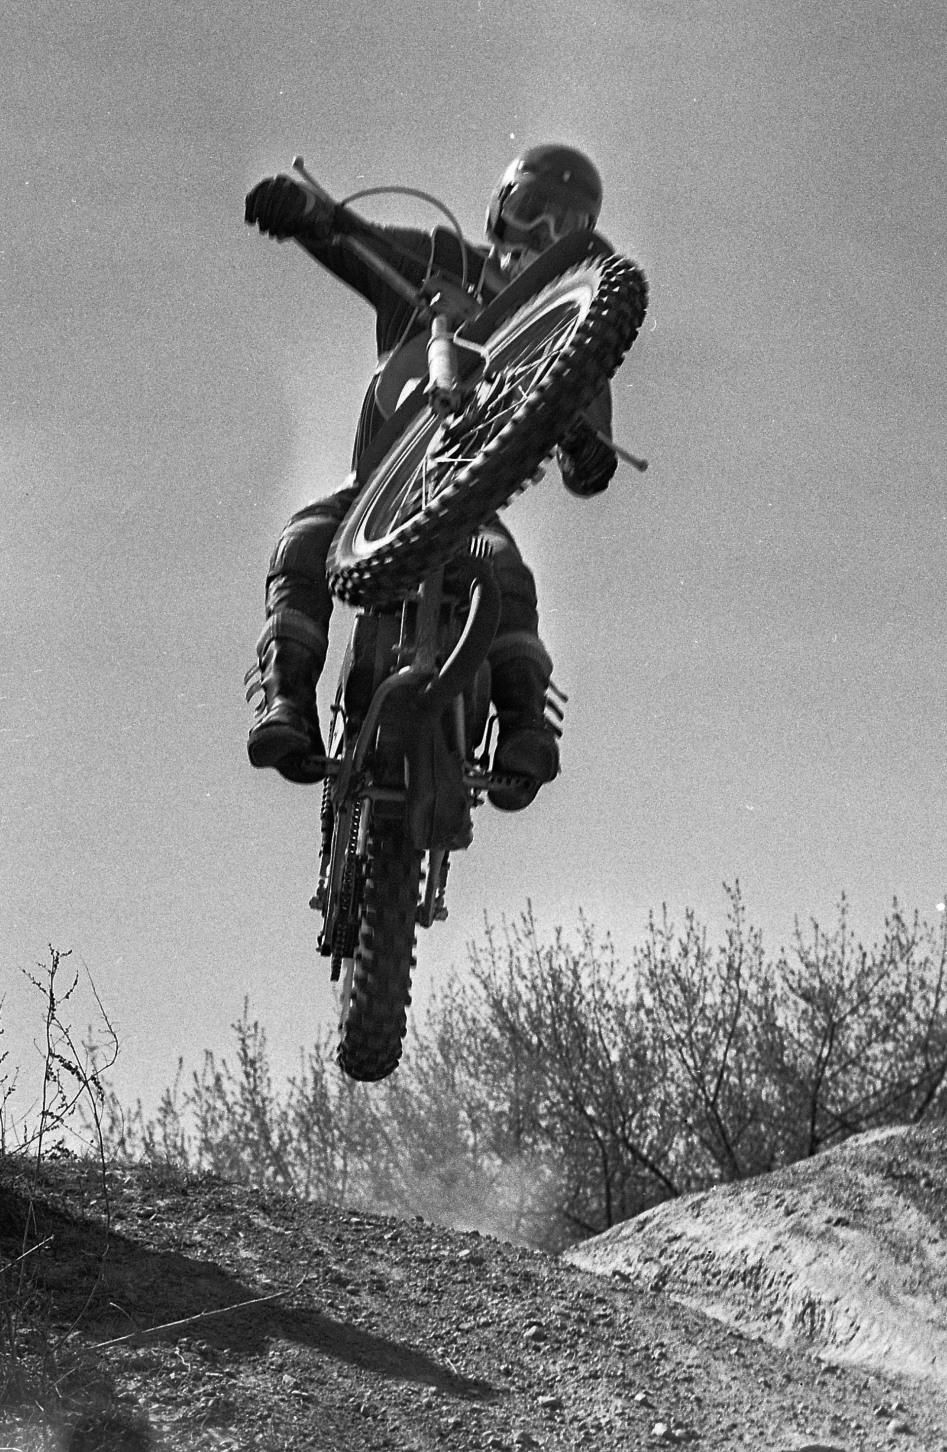 vintage-GP-1960s-44.jpg#asset:37274